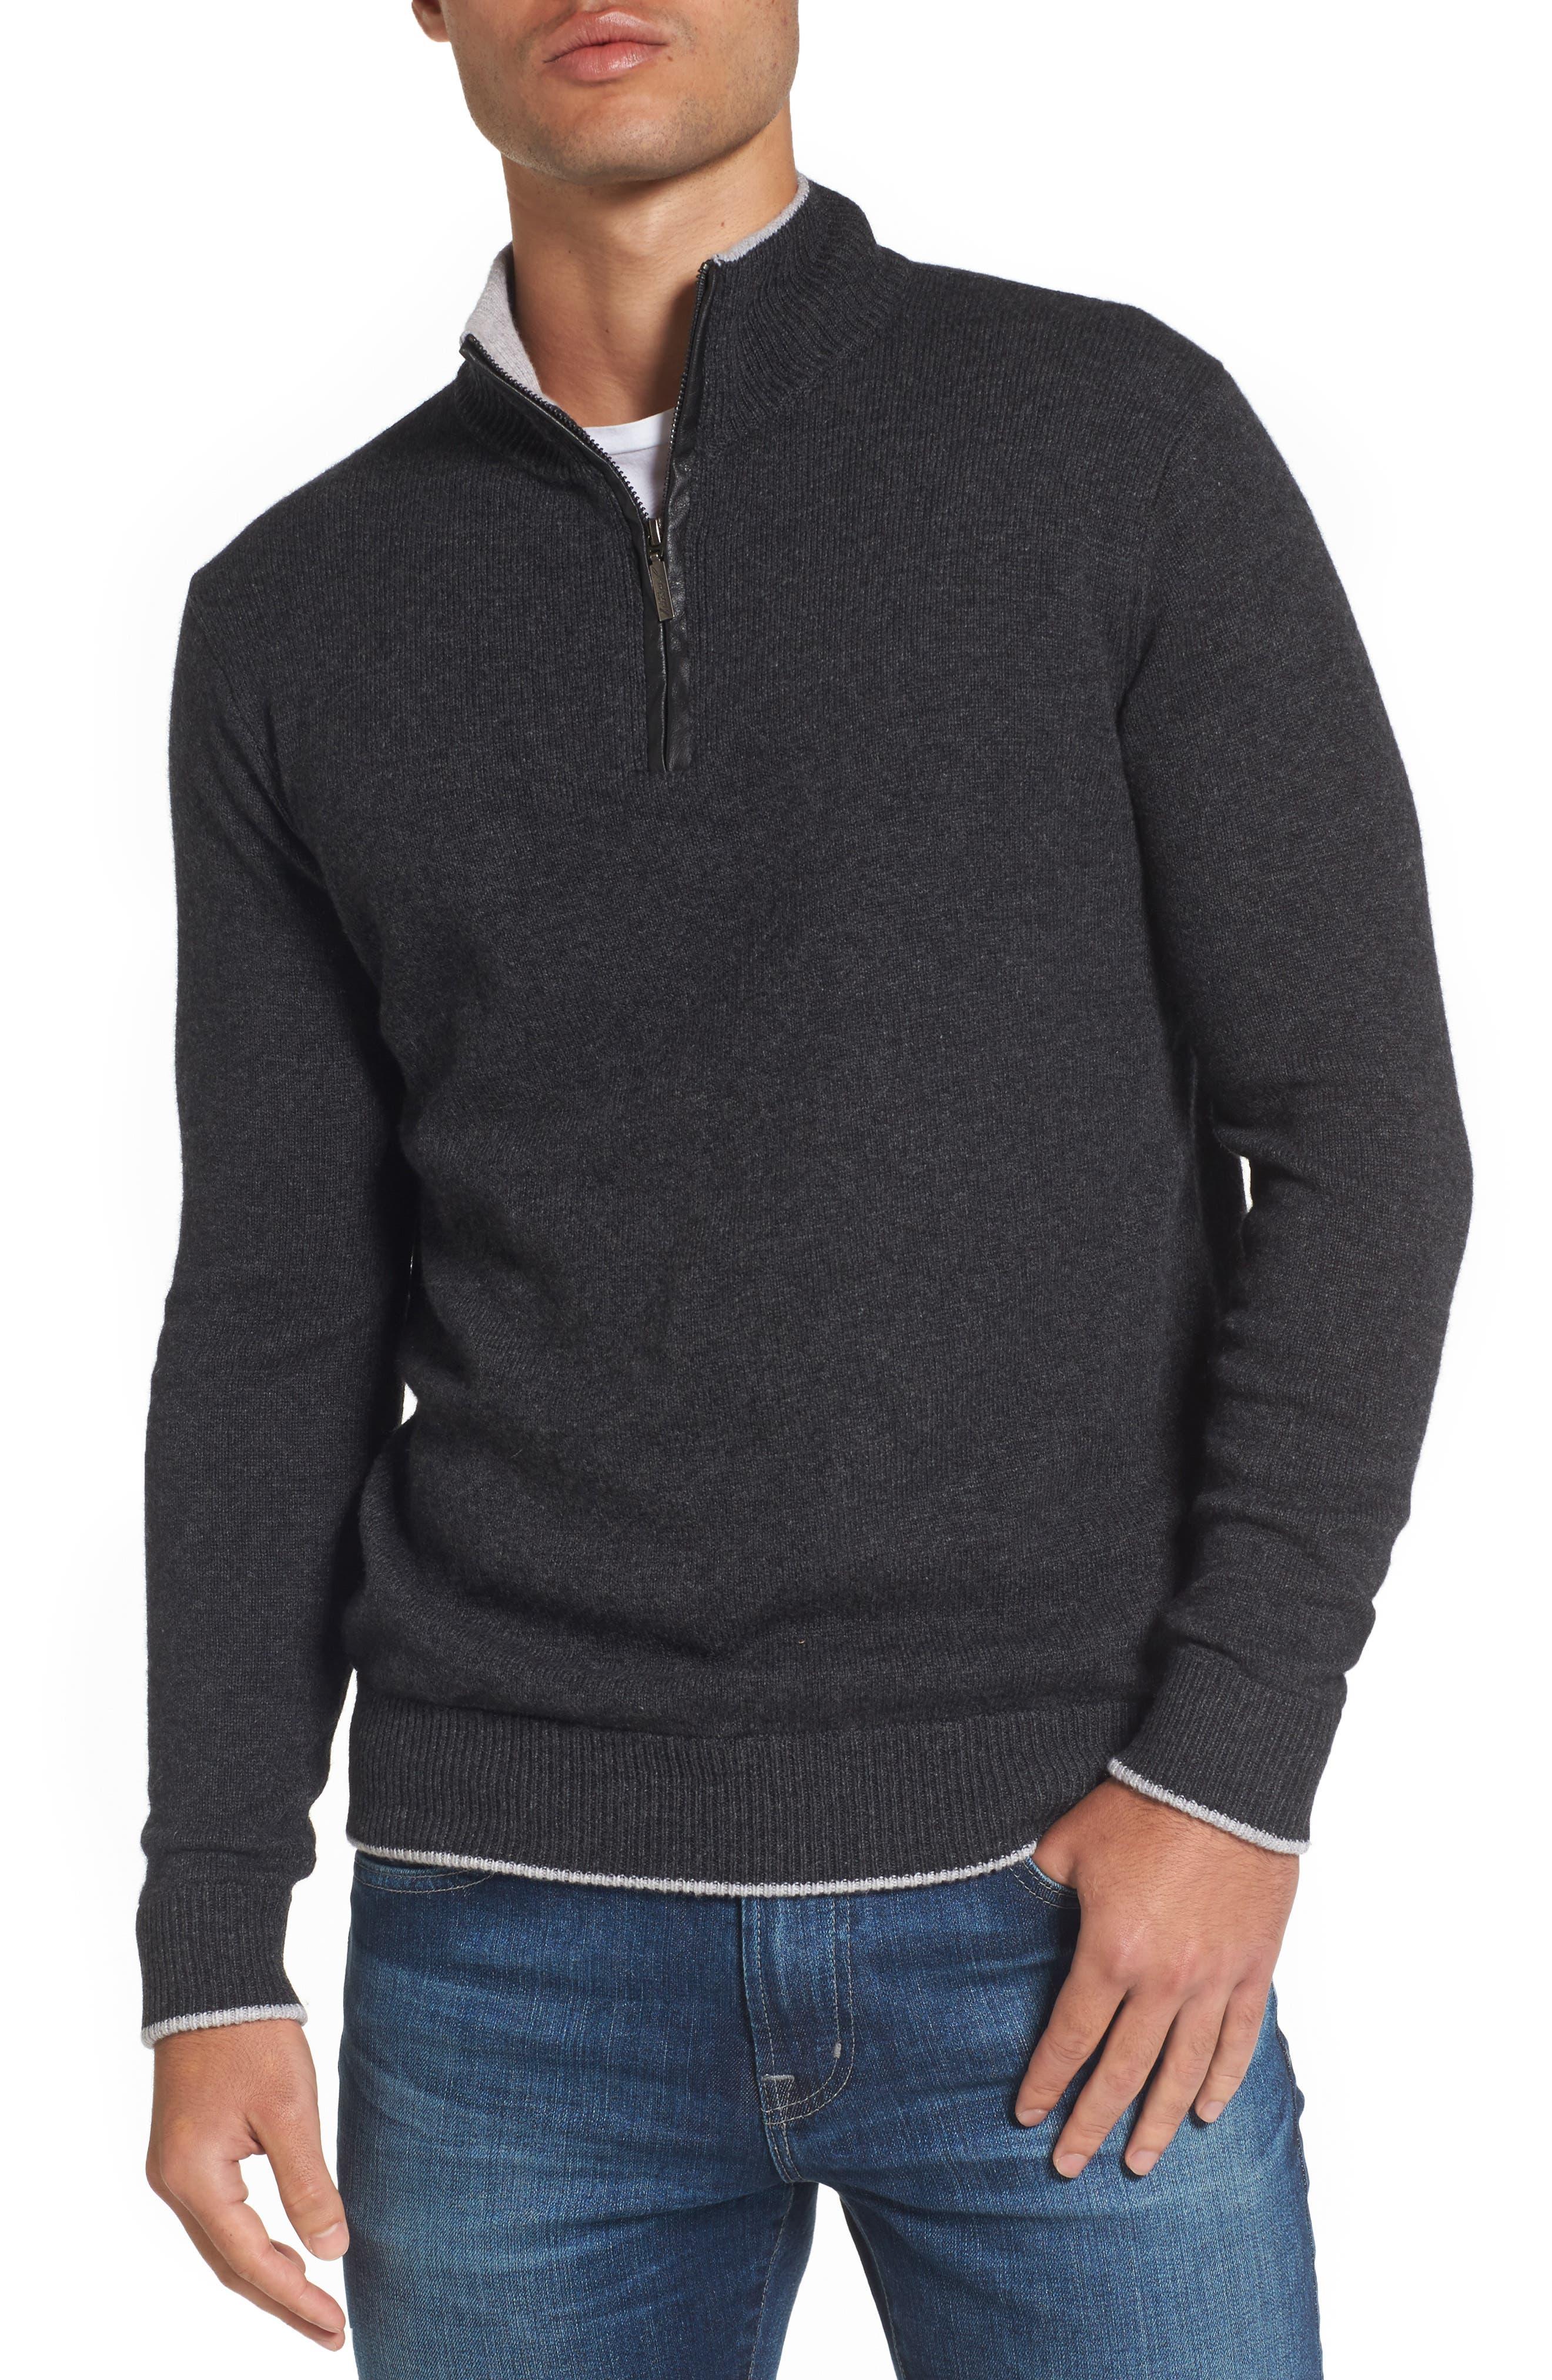 Wool Blend Quarter Zip Sweater,                         Main,                         color, 025